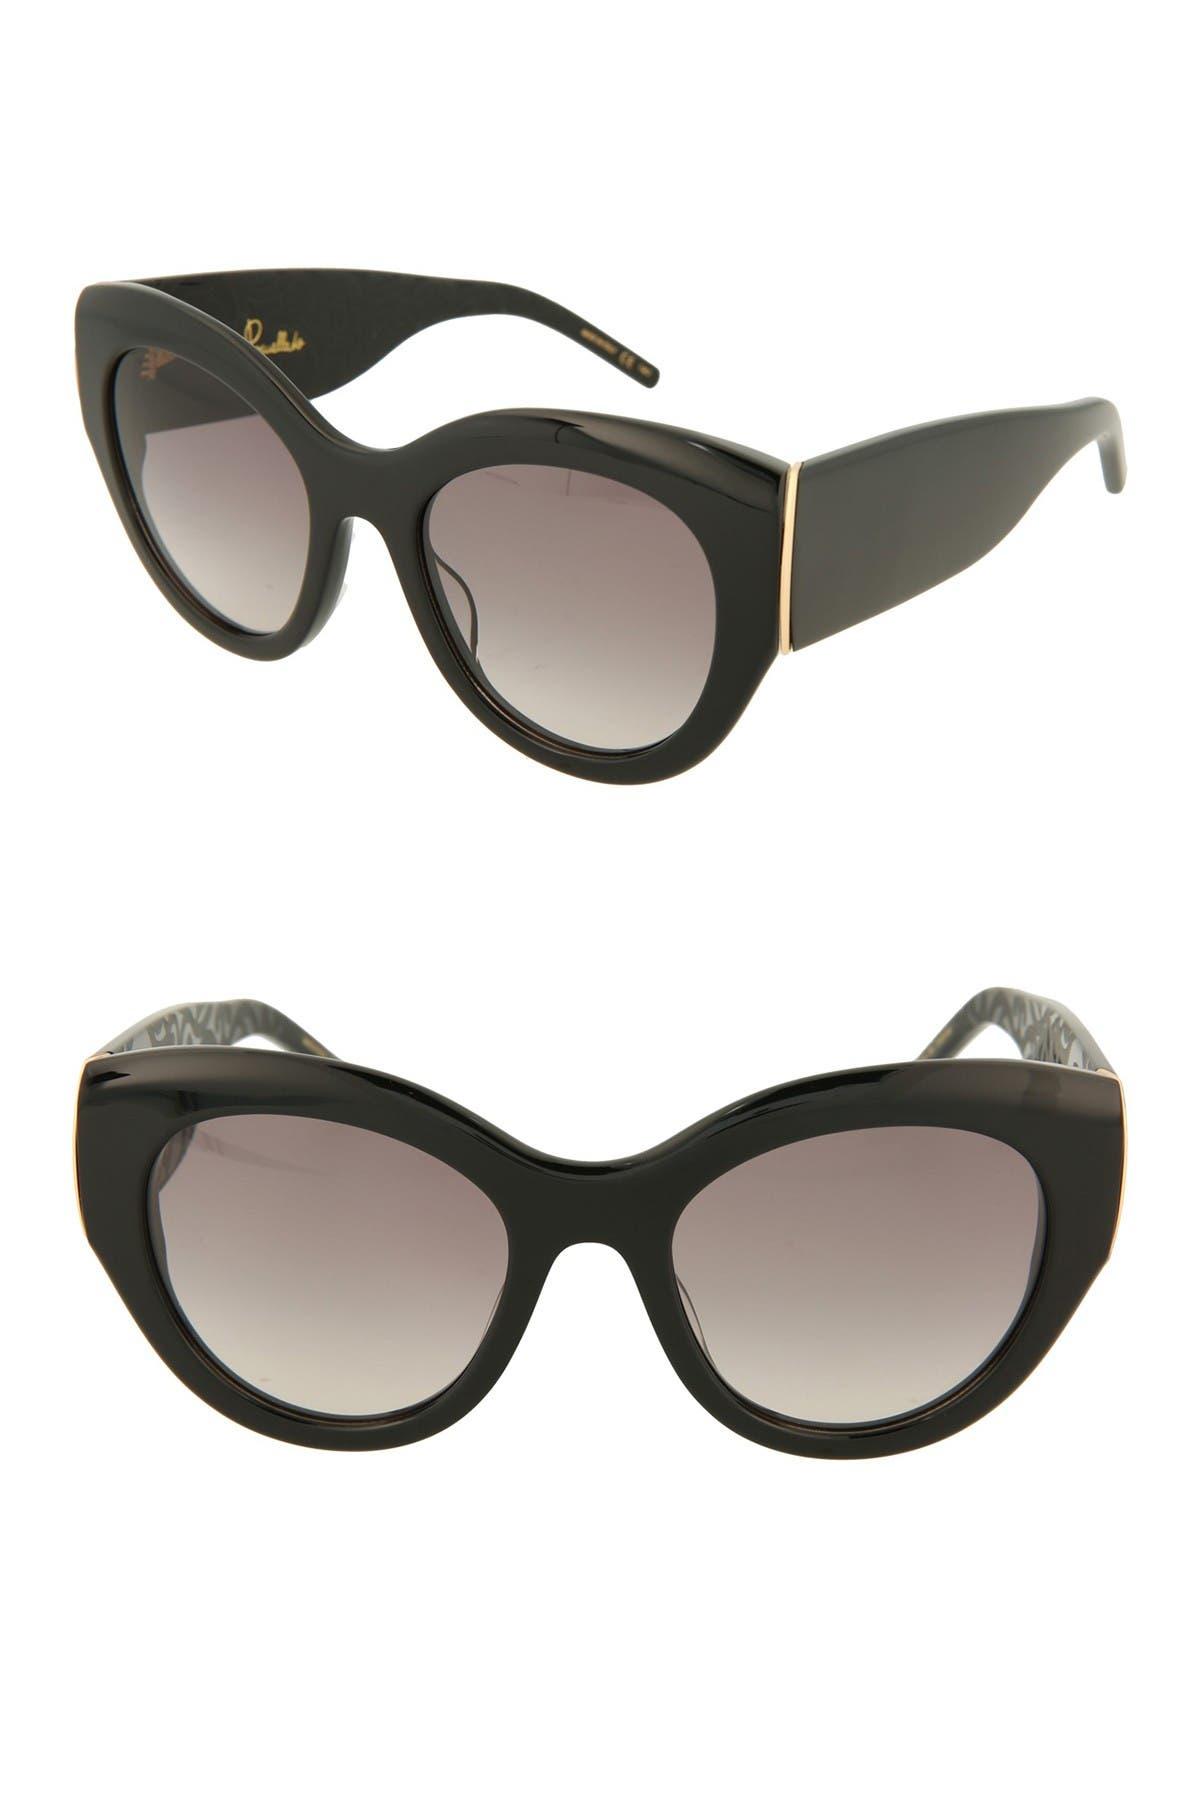 Image of Pomellato 51mm Cat Eye Sunglasses